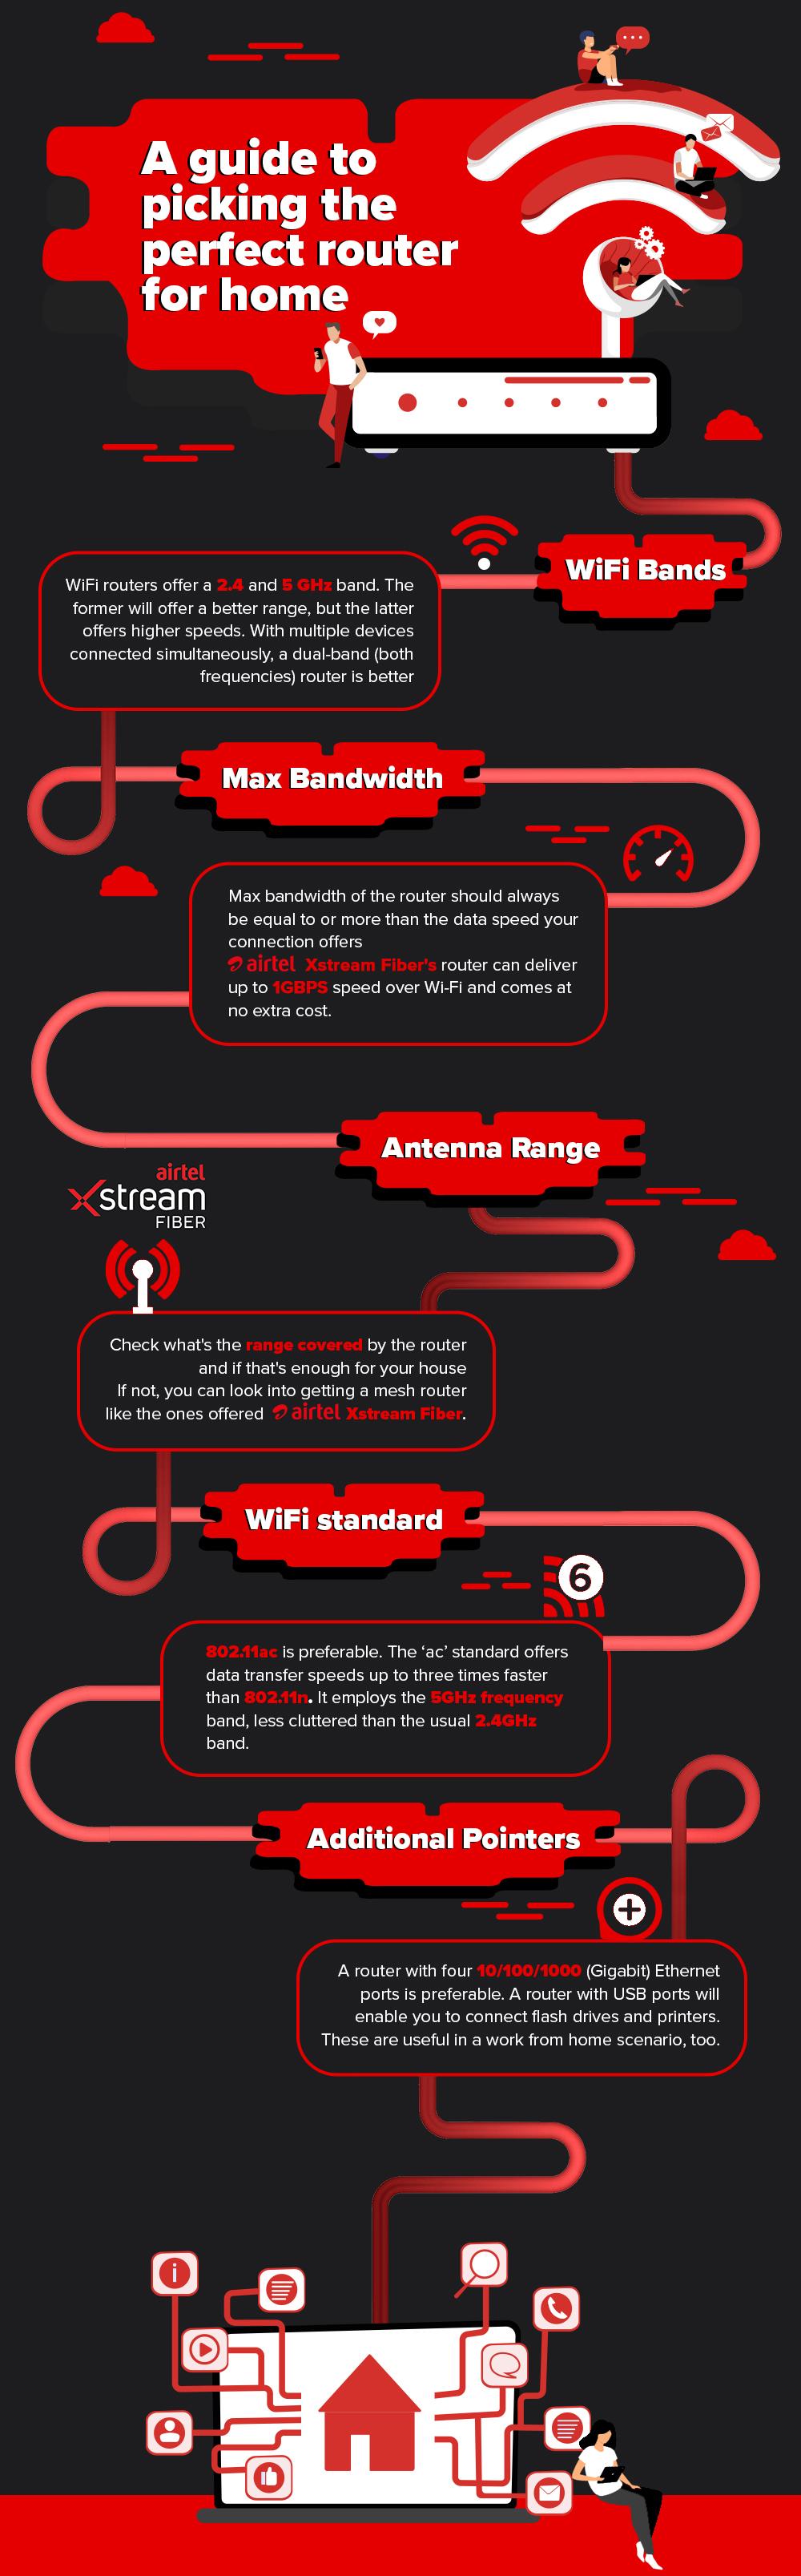 Airtel_infographic_2__Black_bg